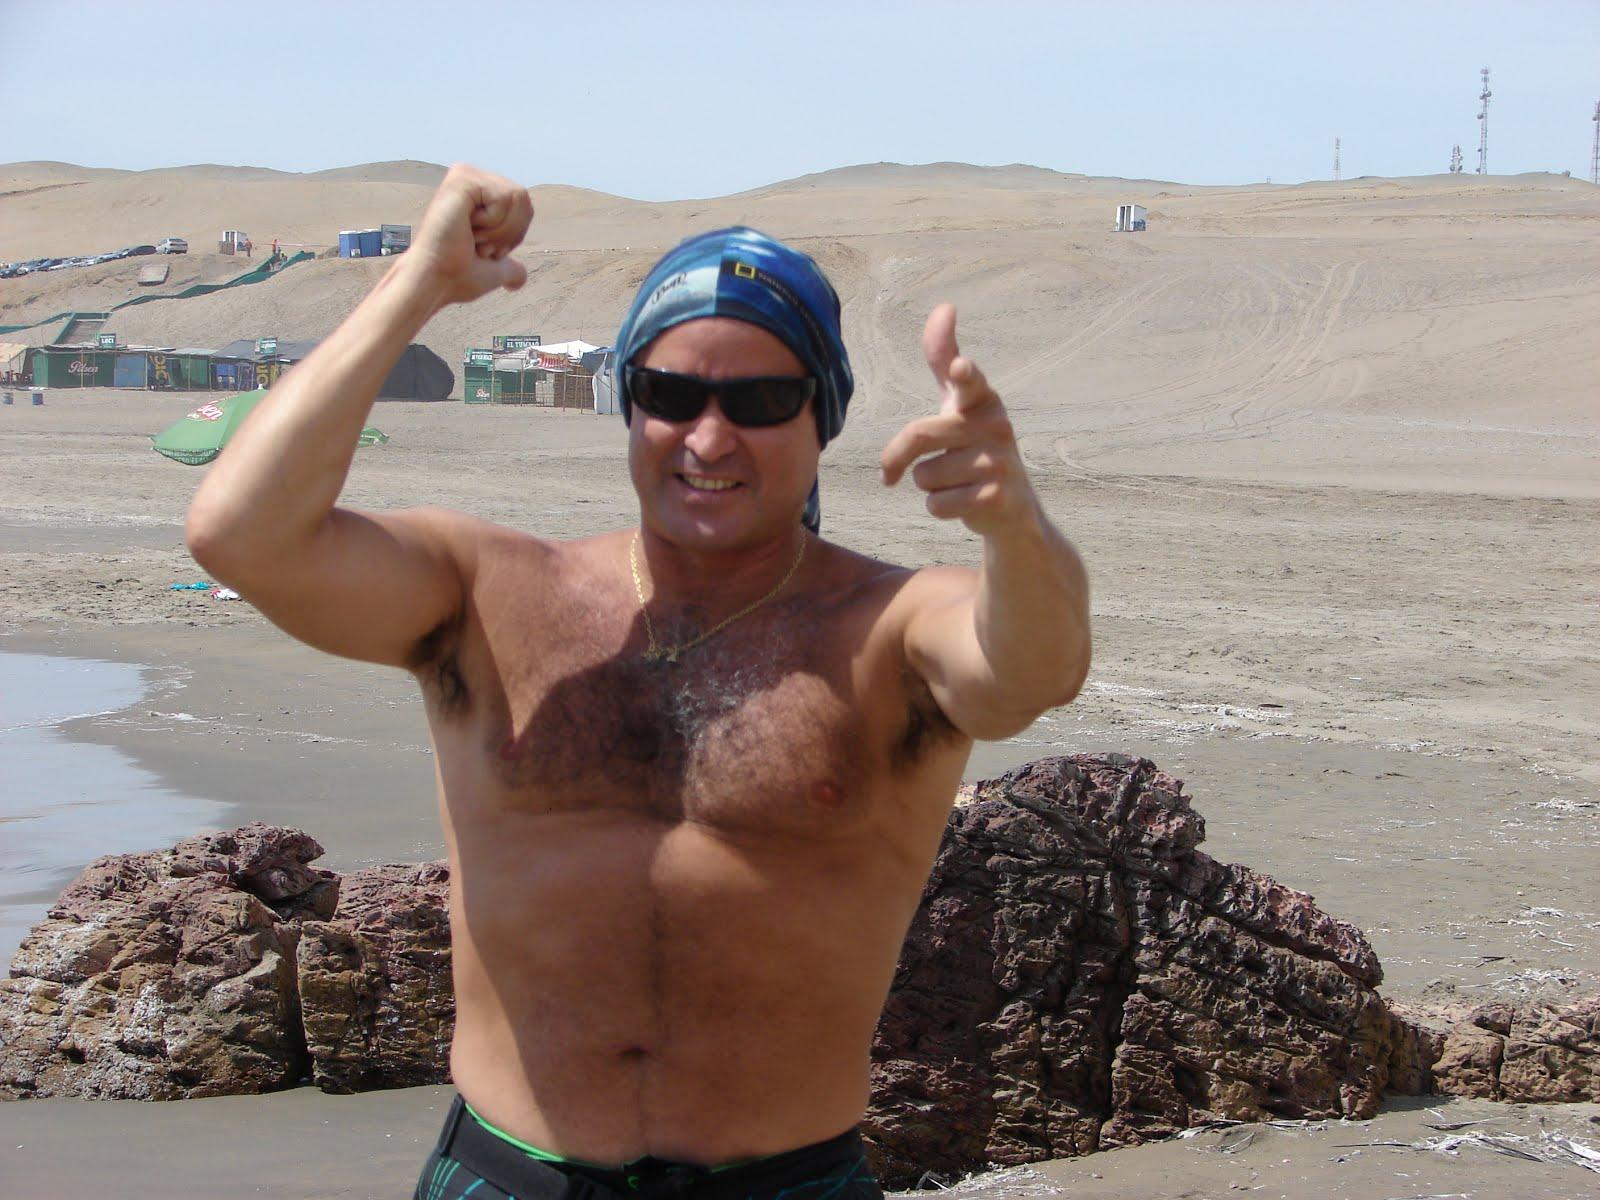 7-8-9-10-11-12-13-.febrero-2013-Descubriendo playa Colorado Huacho-PeruxFito.33.p.AMEN